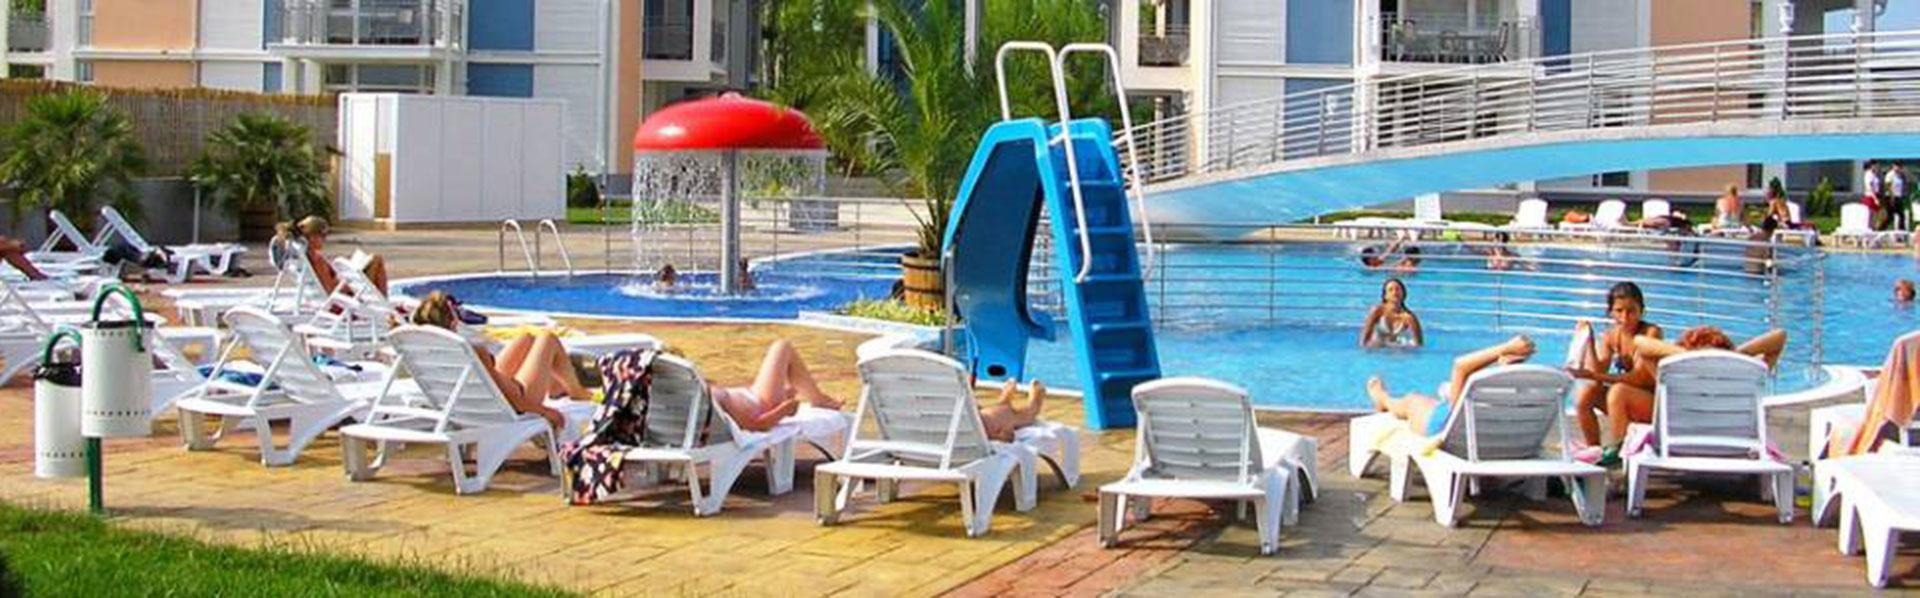 Апарт Хотел Елит 2, басейни